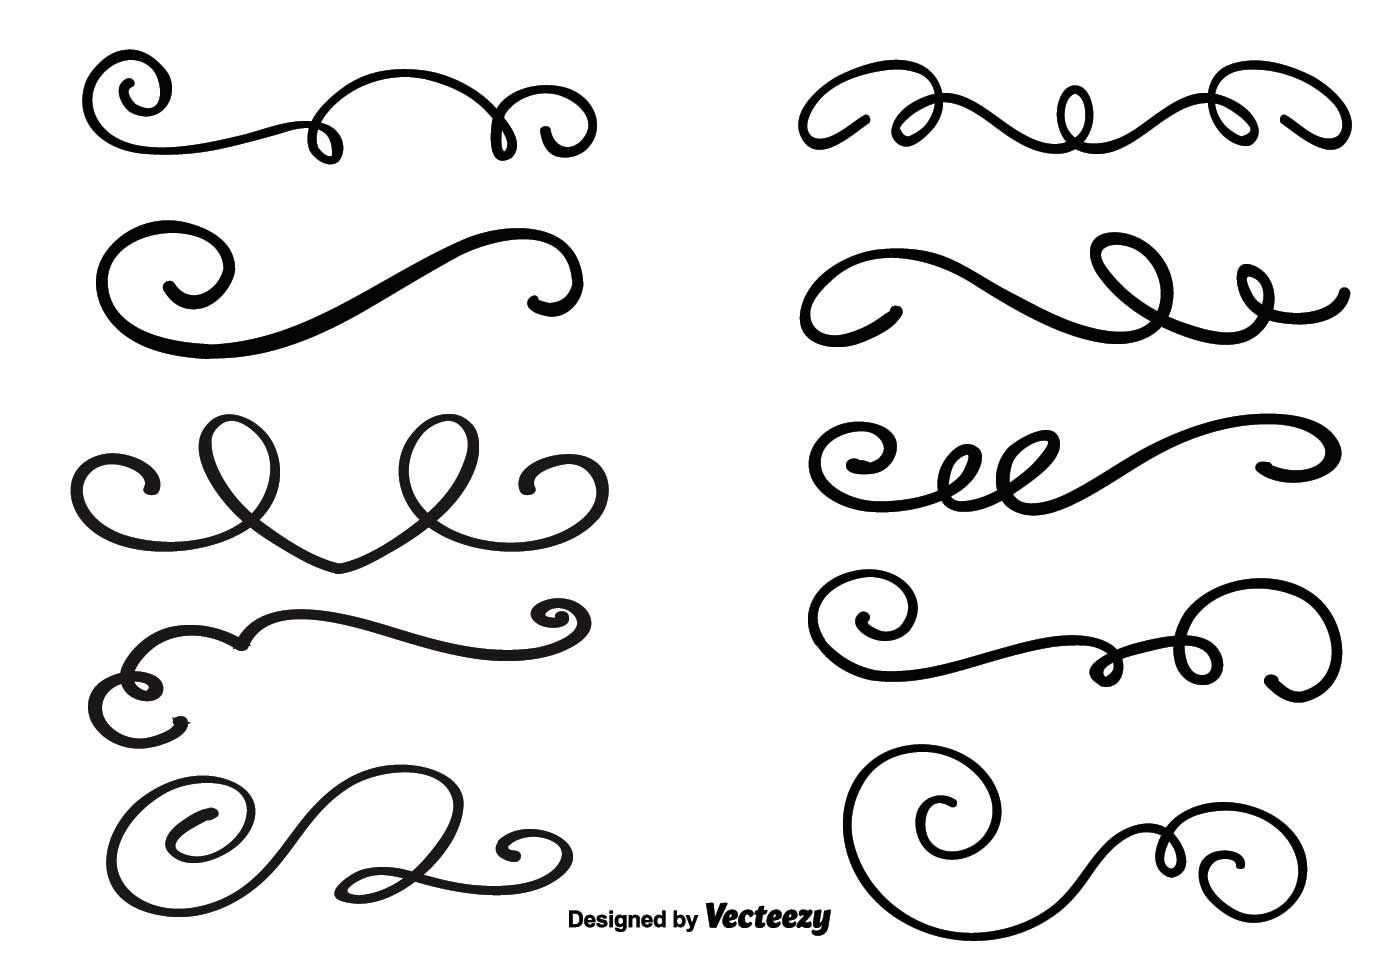 Decorative Vector Swirls